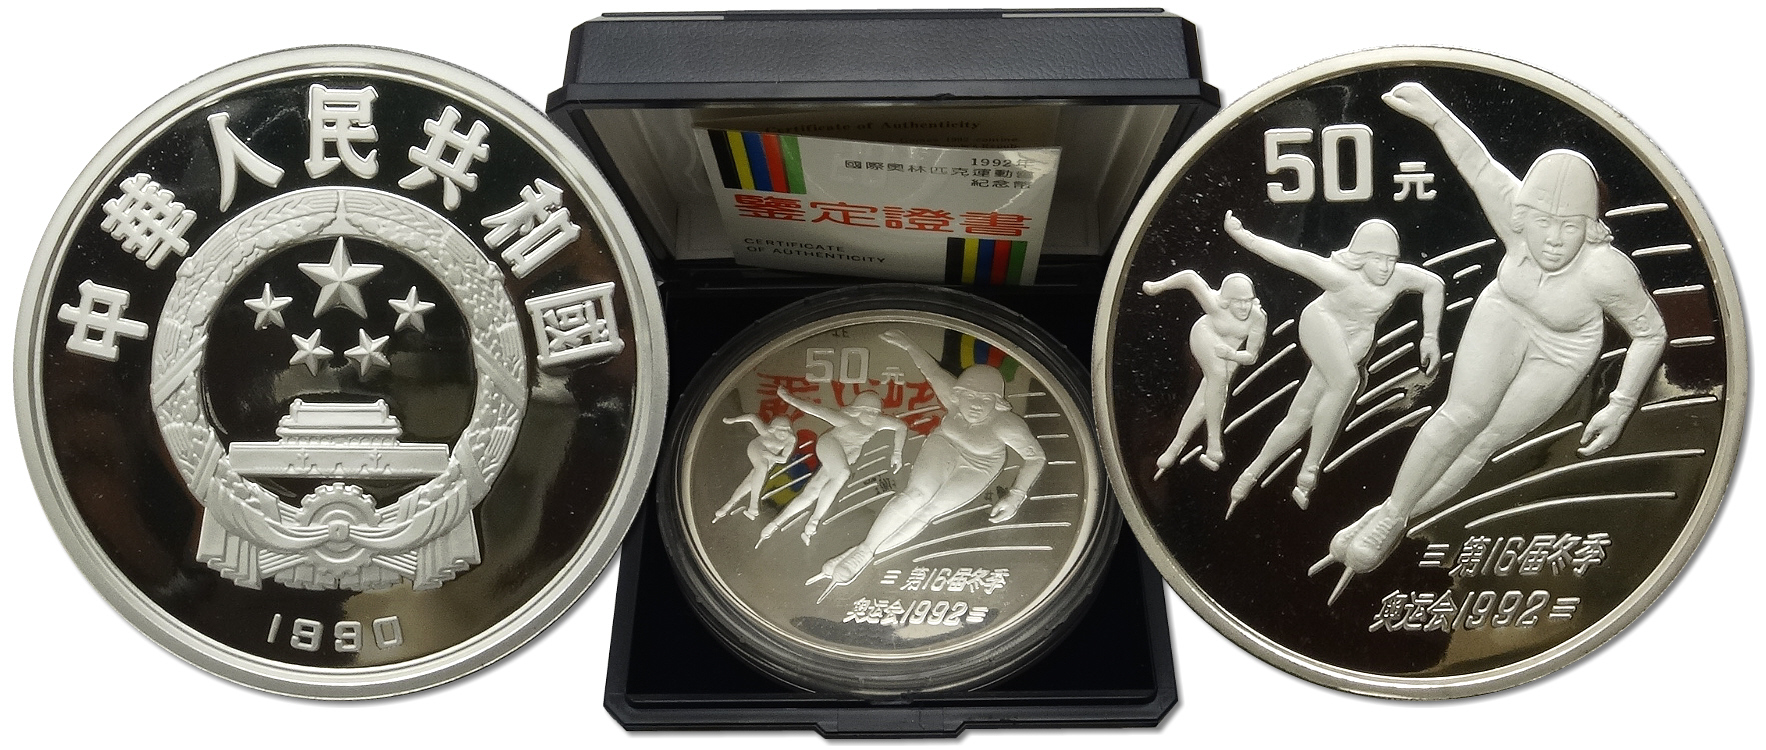 24.CHINY, 50 YUANÓW 1990 ŁYŻWIARSTWO - ALBERTVILLE